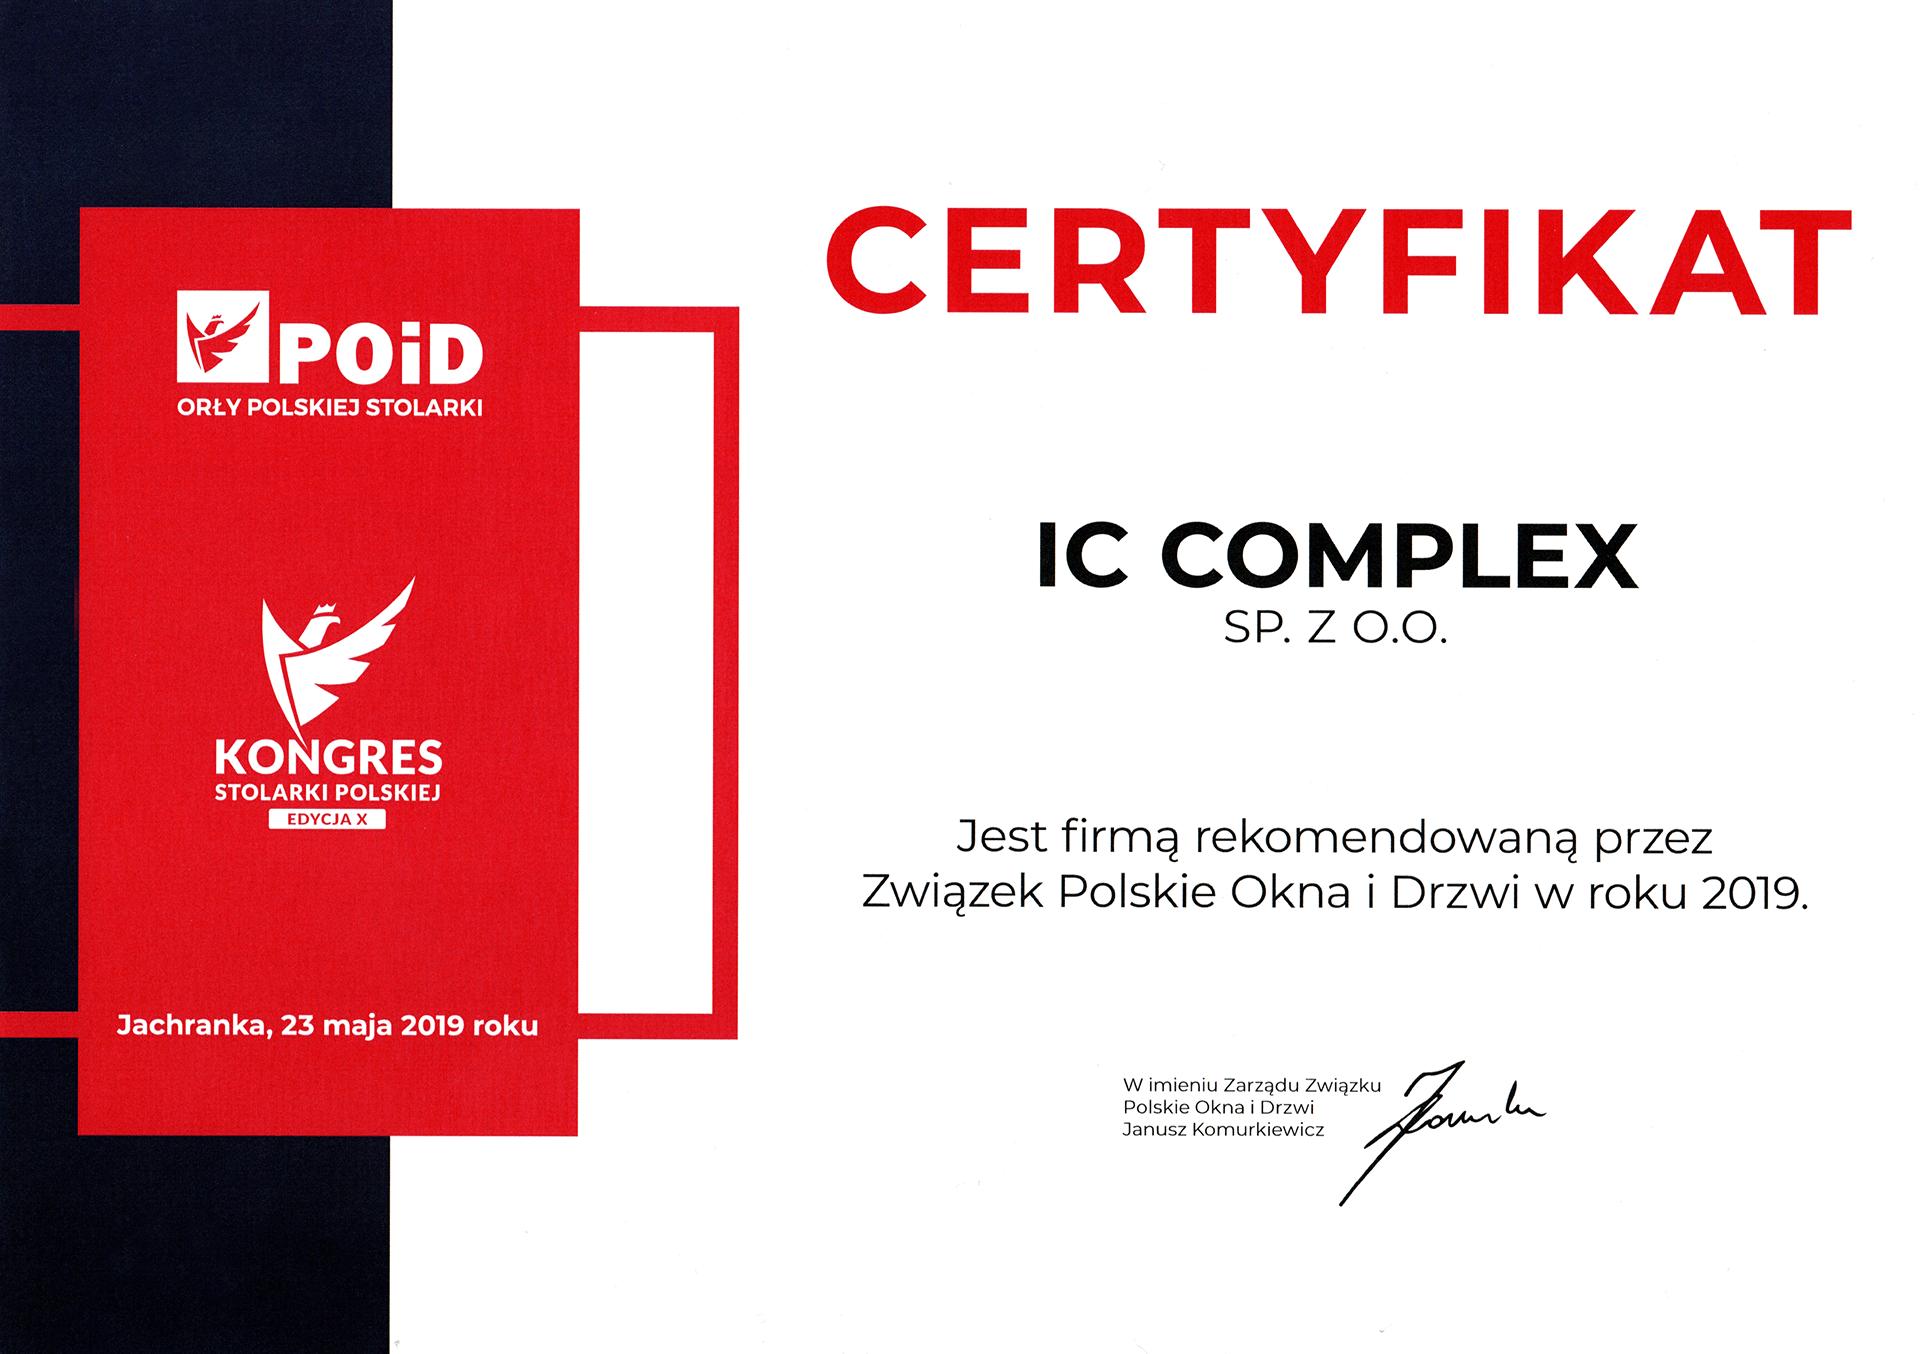 certyfikat_ic_complex